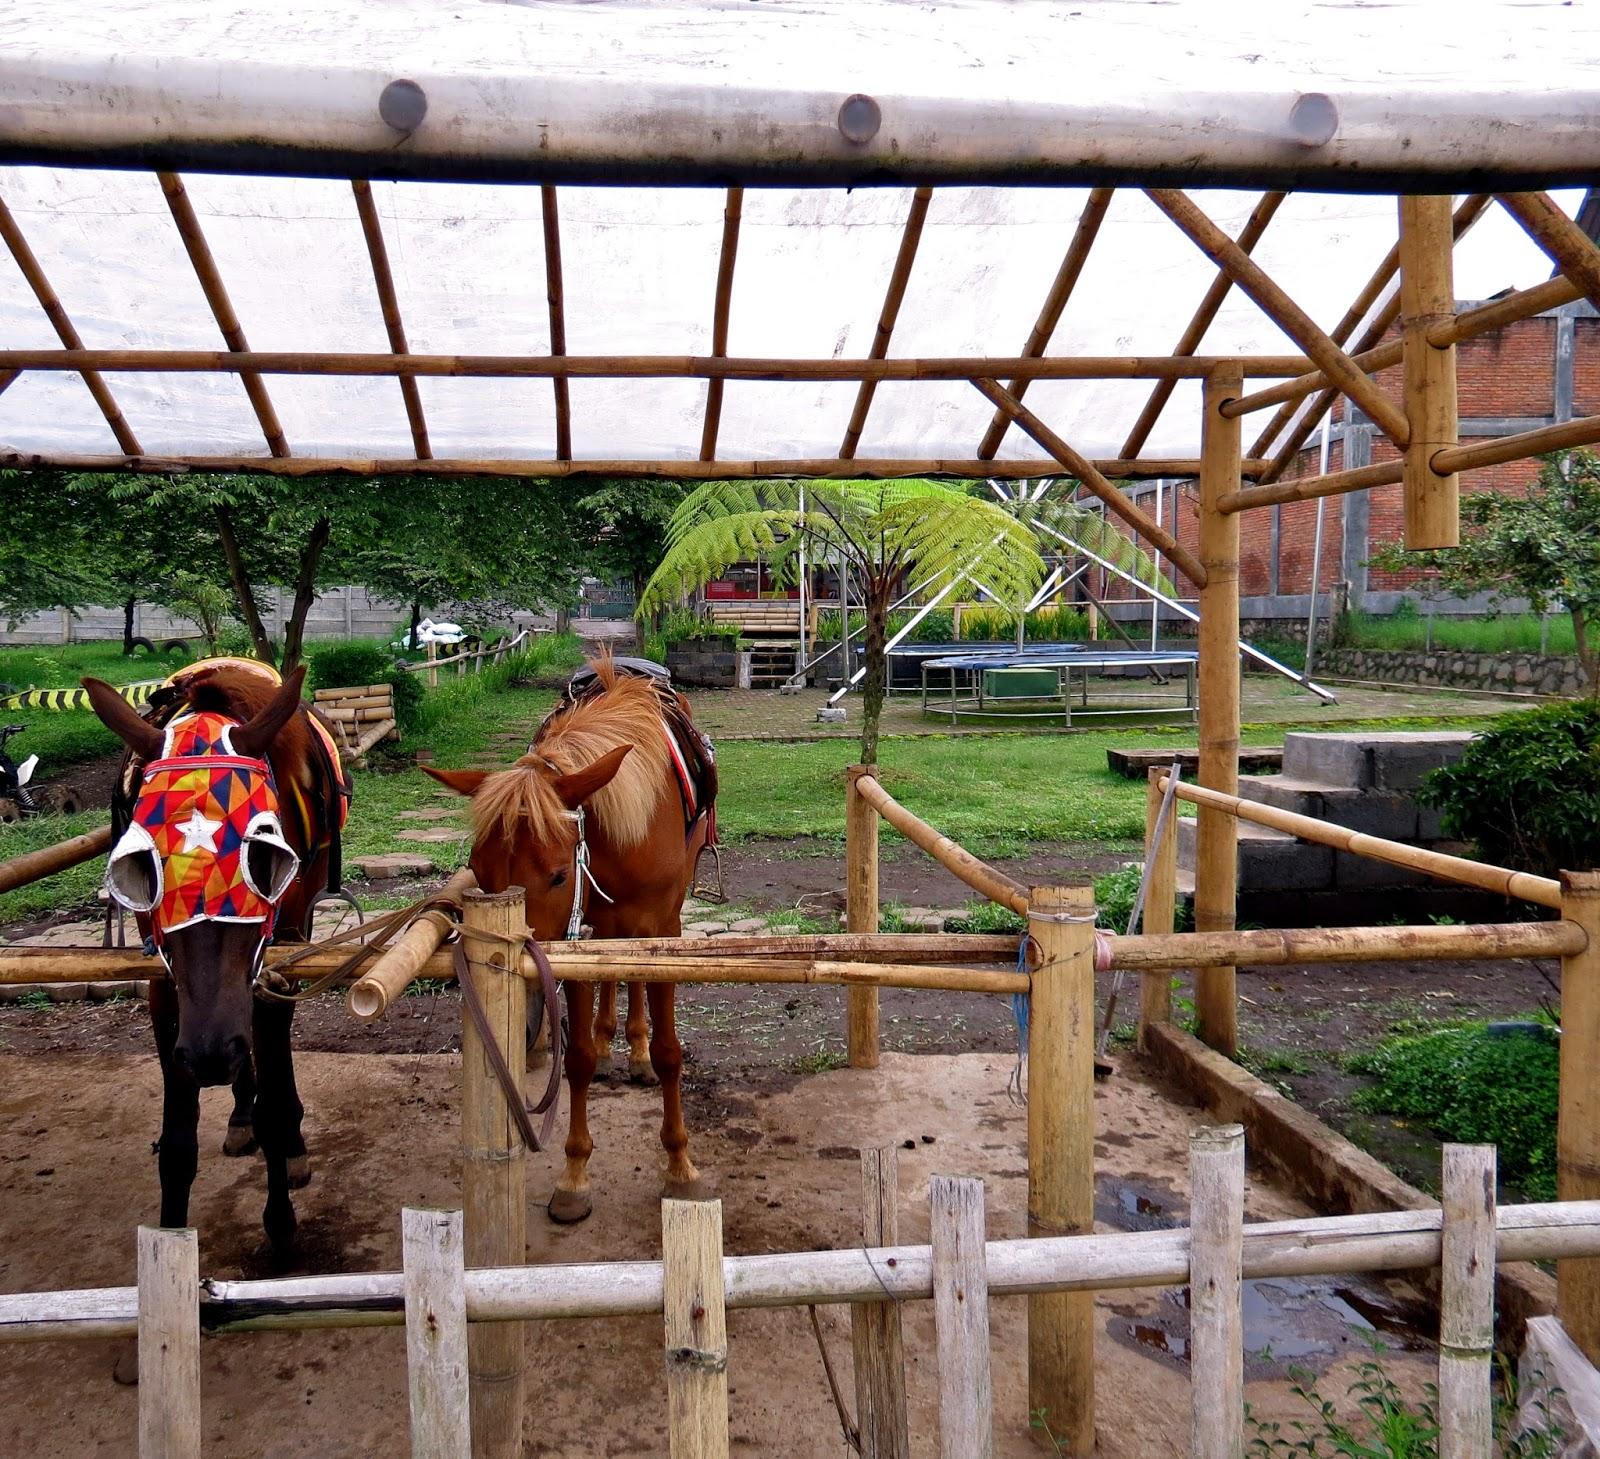 bandung horses